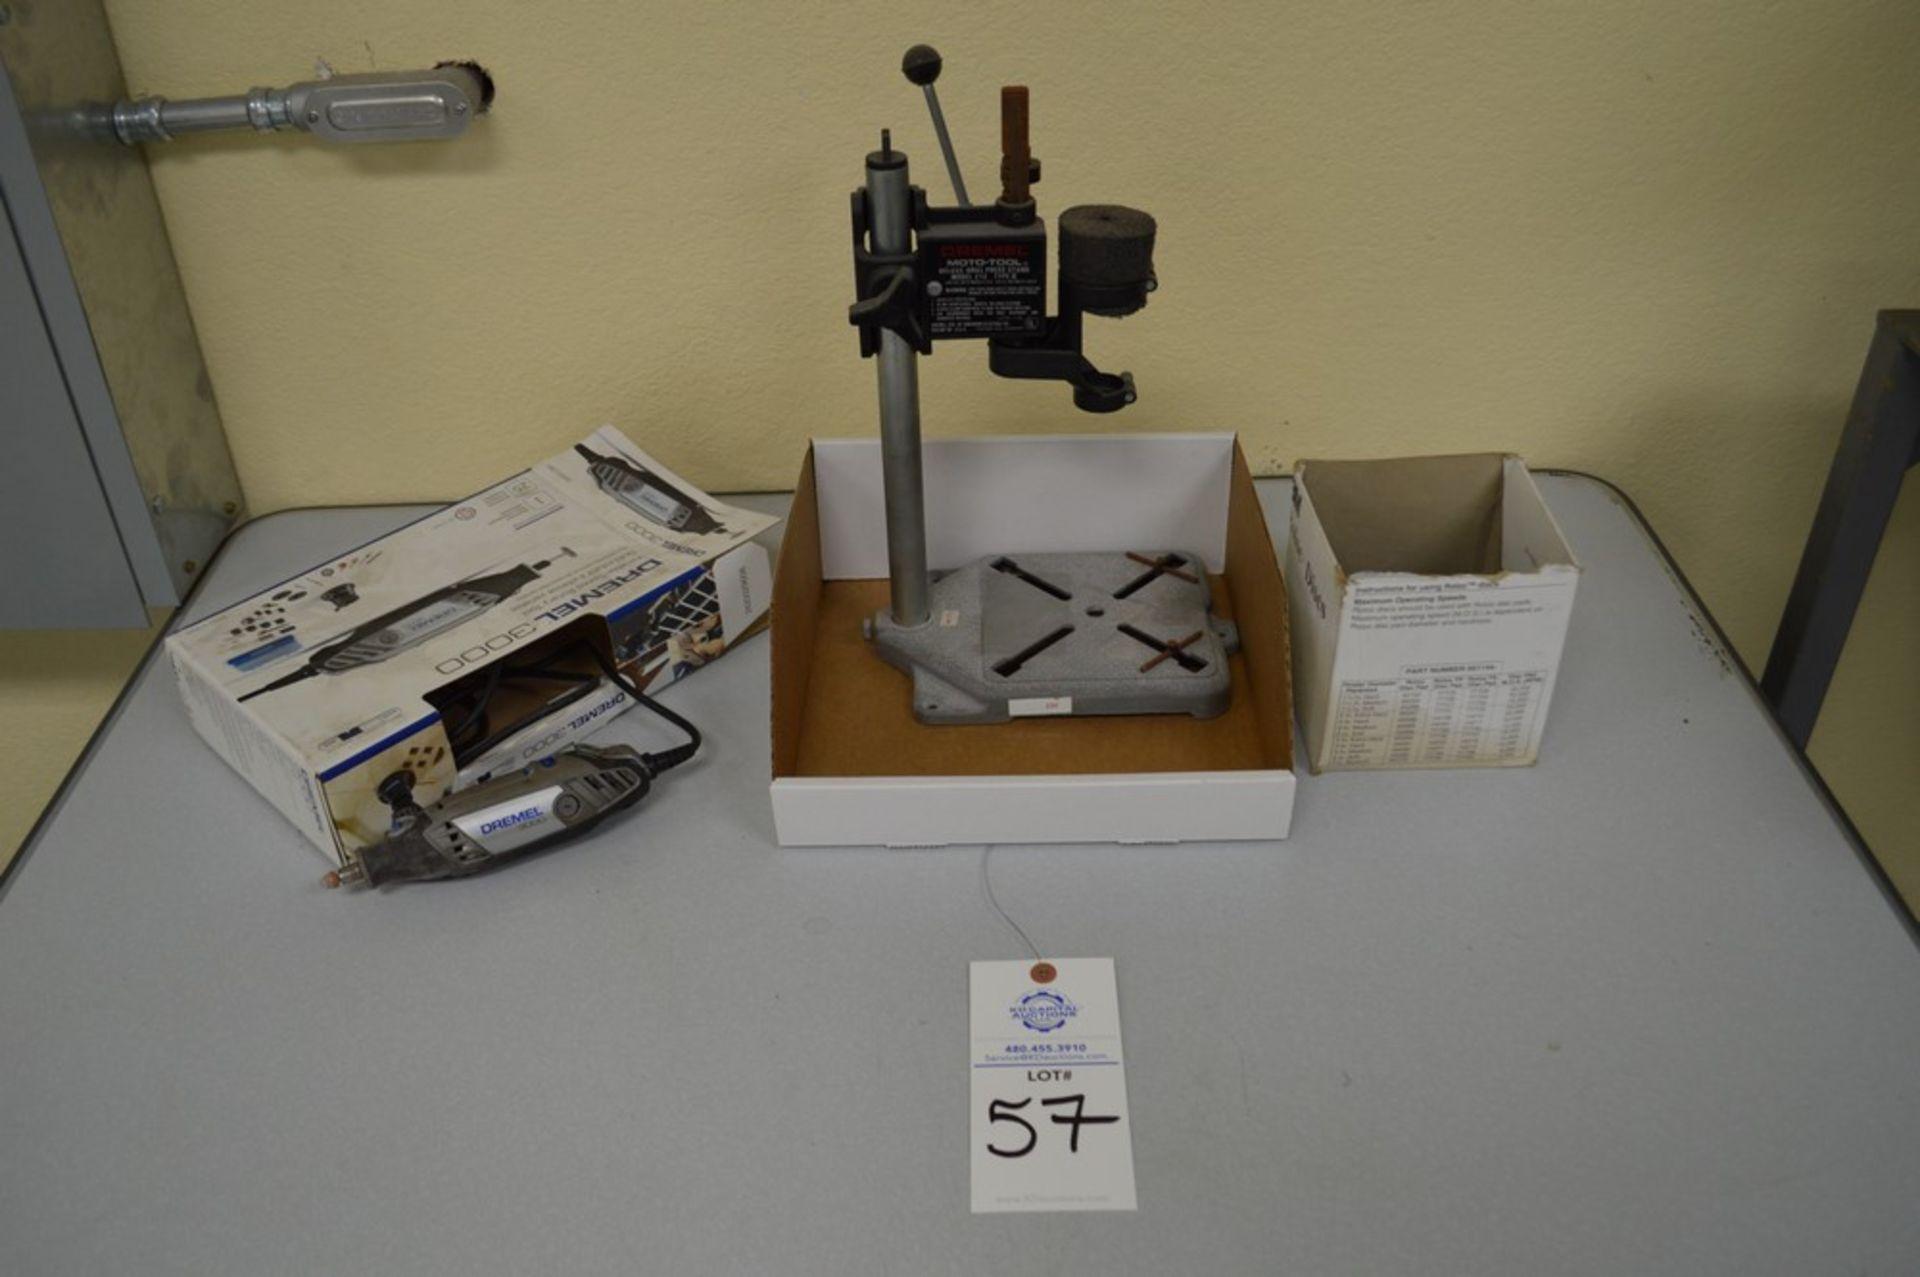 Dremmel 3000, extara sanding discs, Moto tool model 212